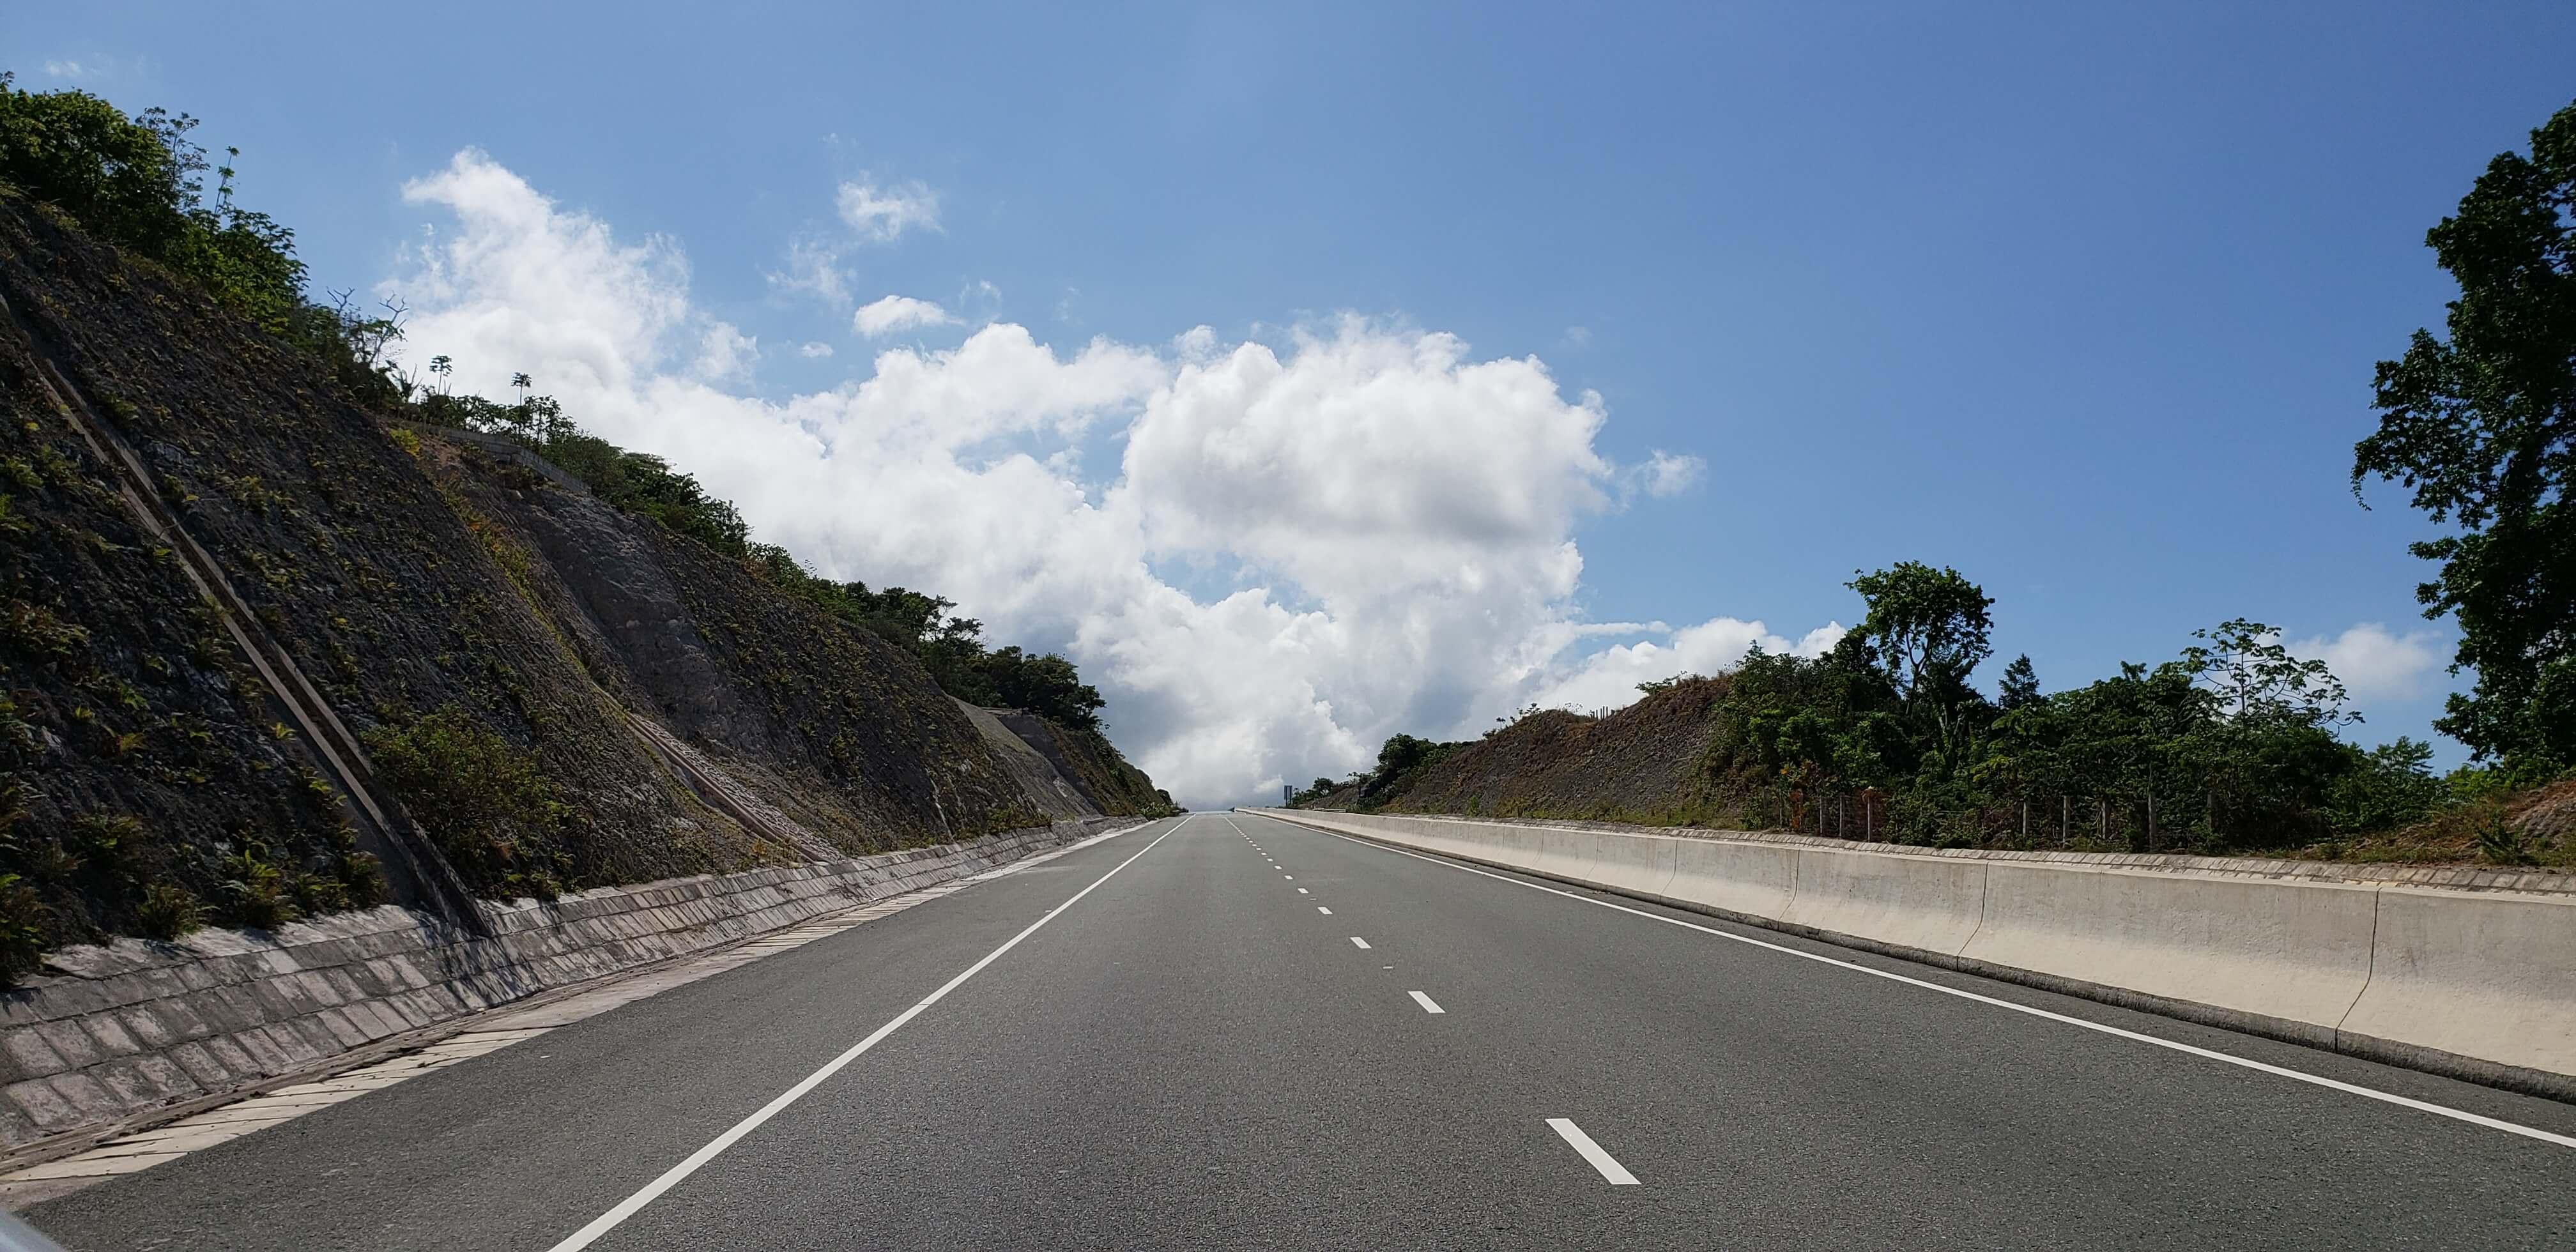 jamaica road map - transportation_in_jamaica_edward_seaga_highway